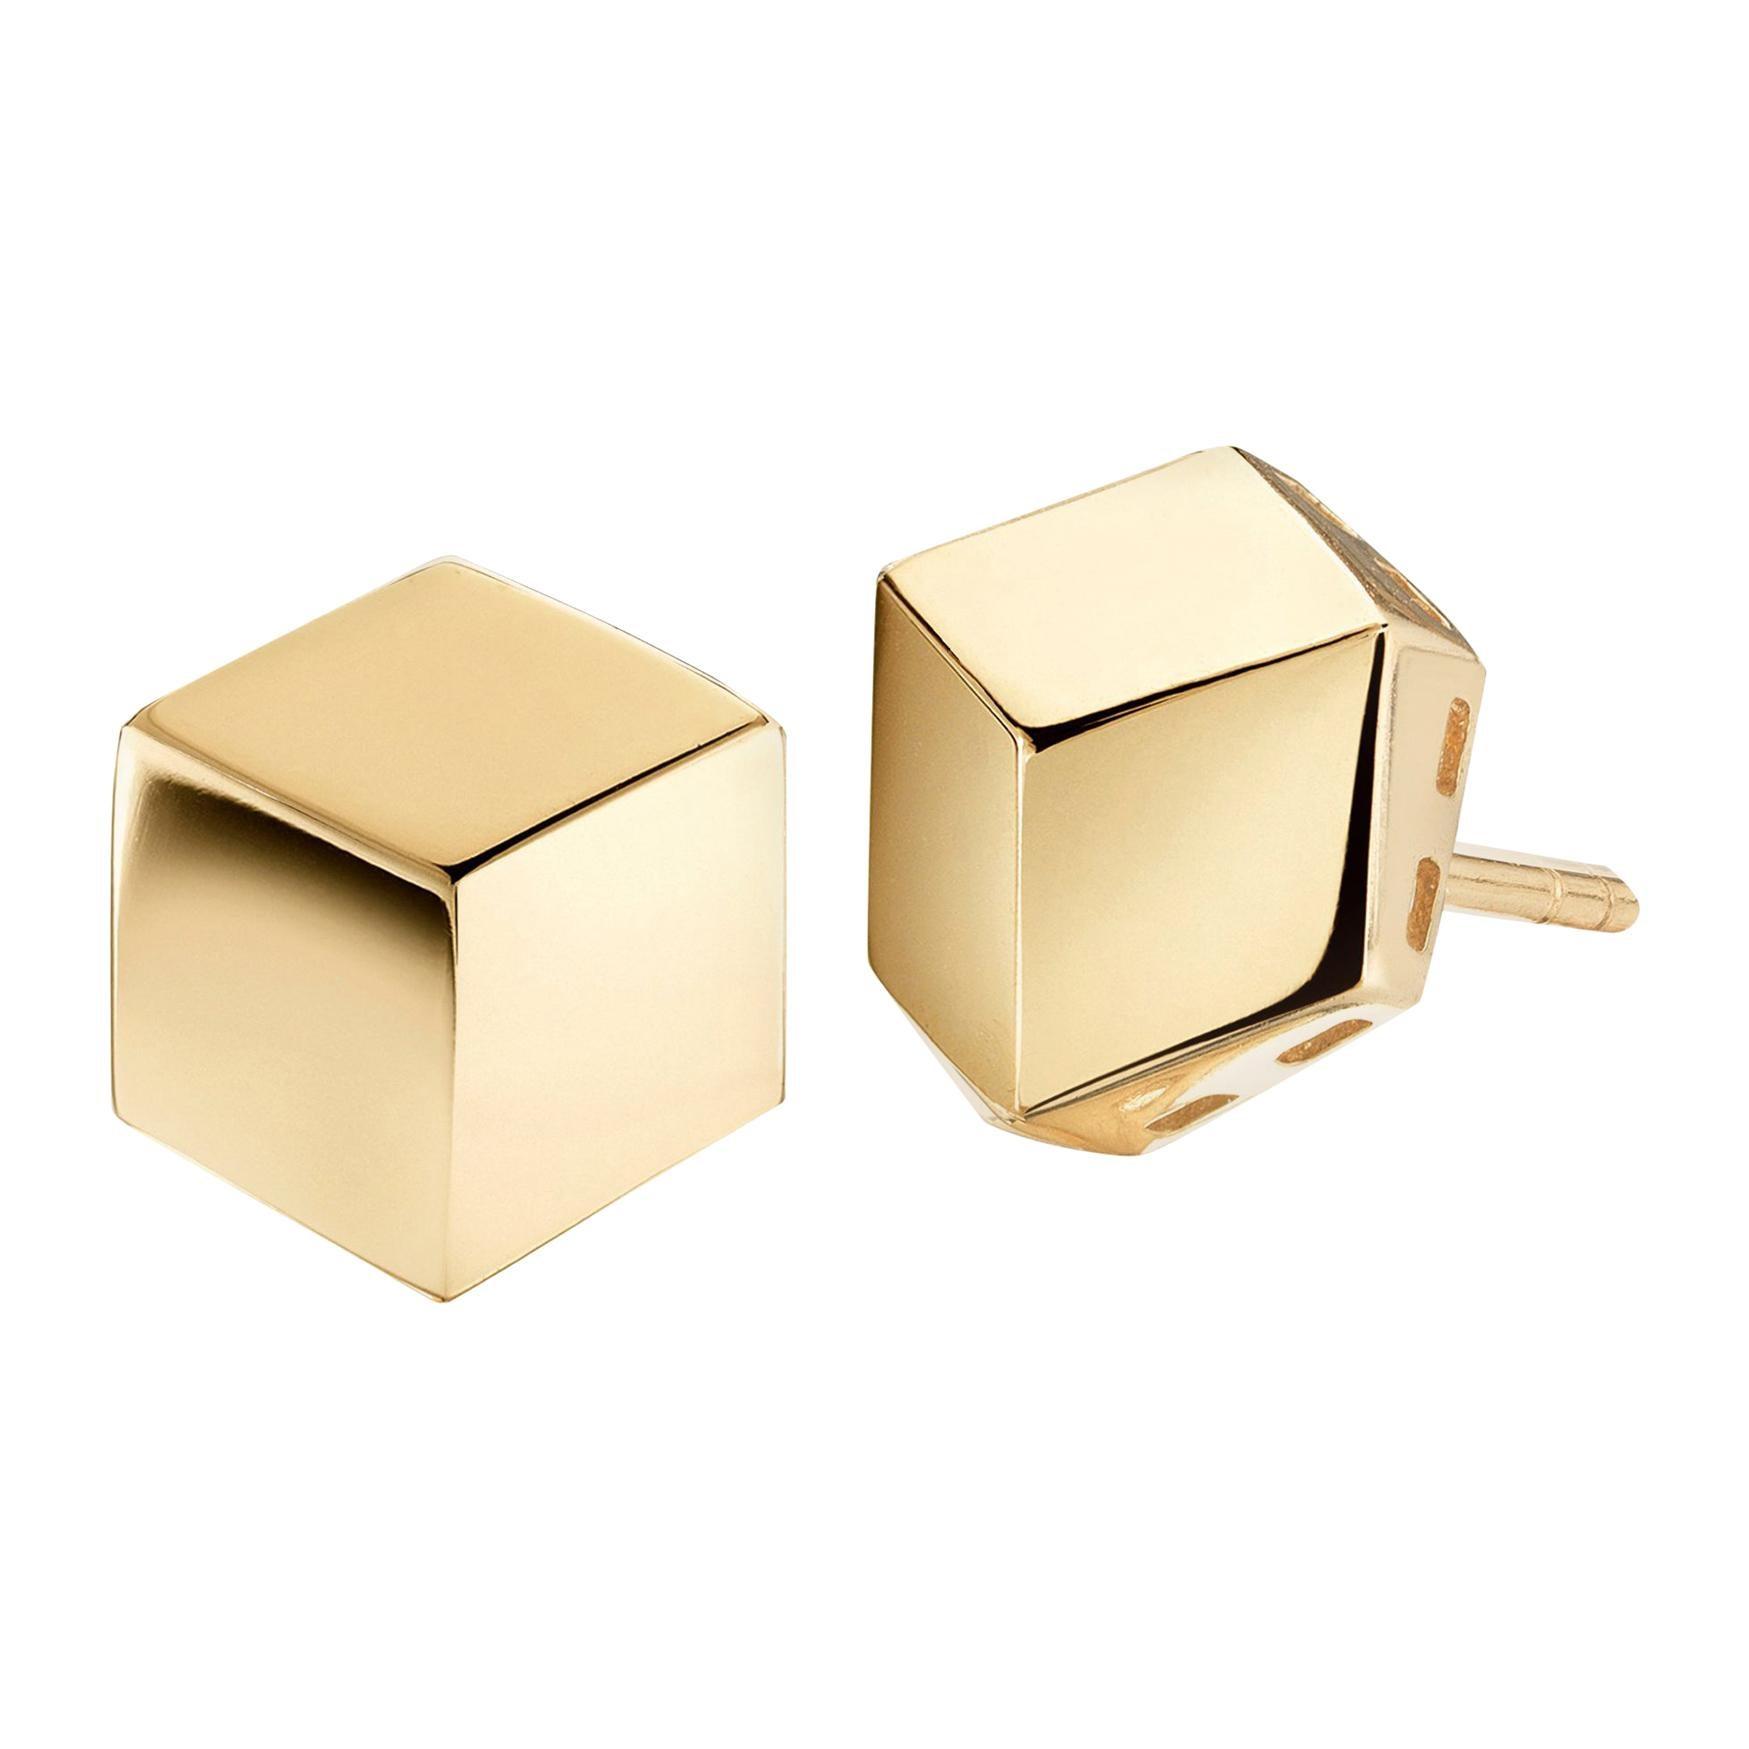 Paolo Costagli 18 Karat Yellow Gold Brillante Stud Earrings, Grande